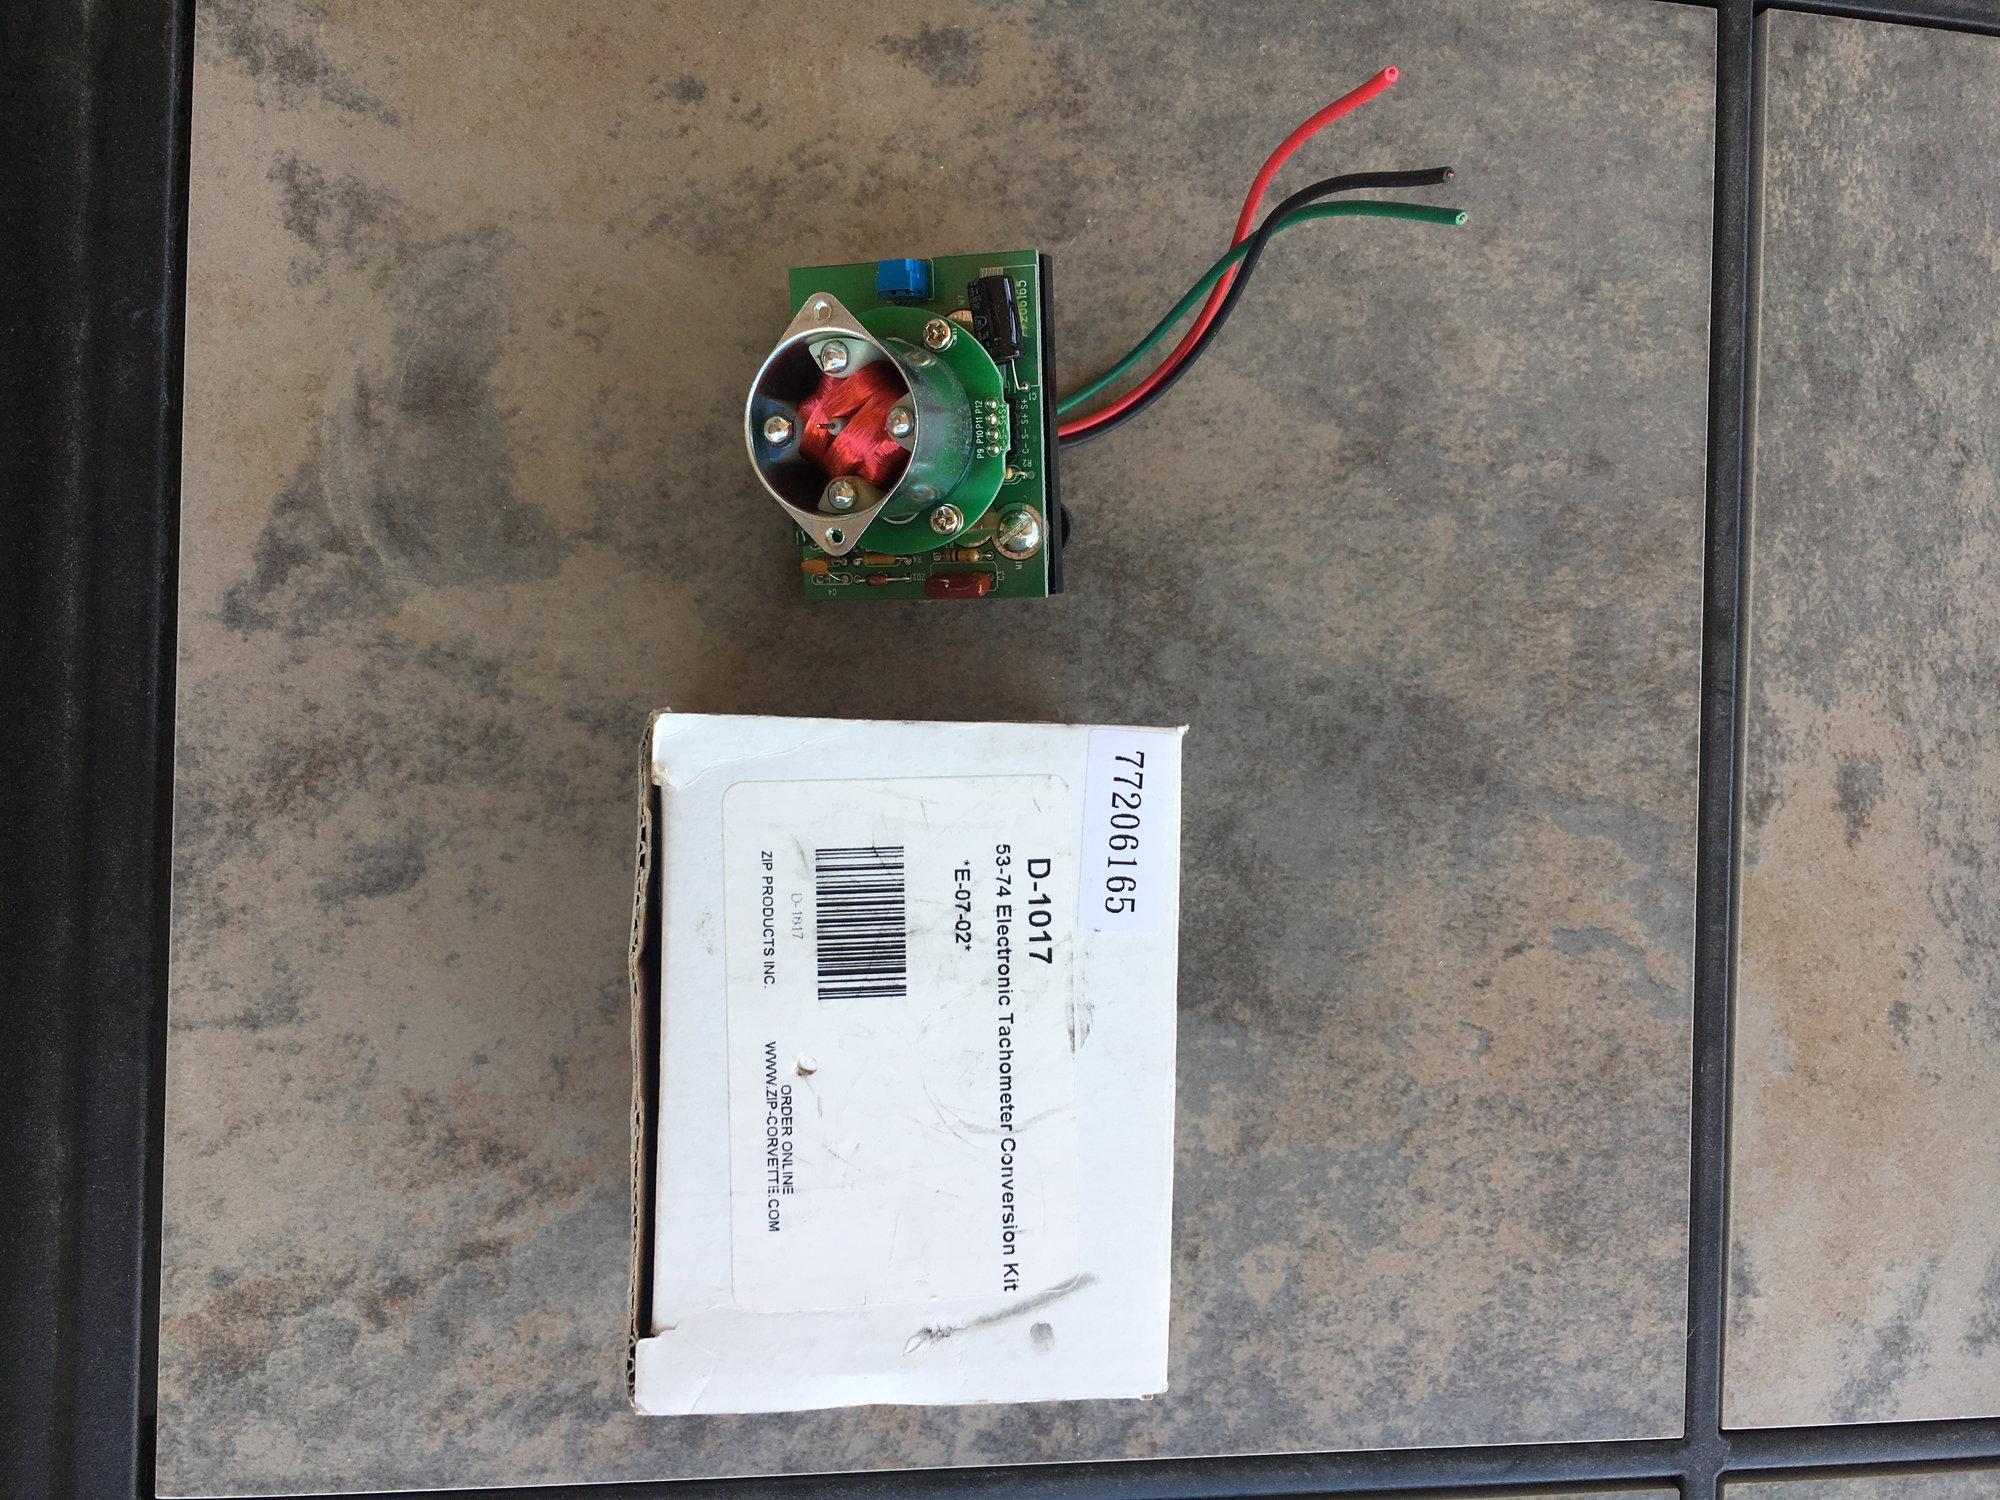 hei distributor tach output signal scosche loc2sl wiring diagram corvette electronic tachometer conversion kit best